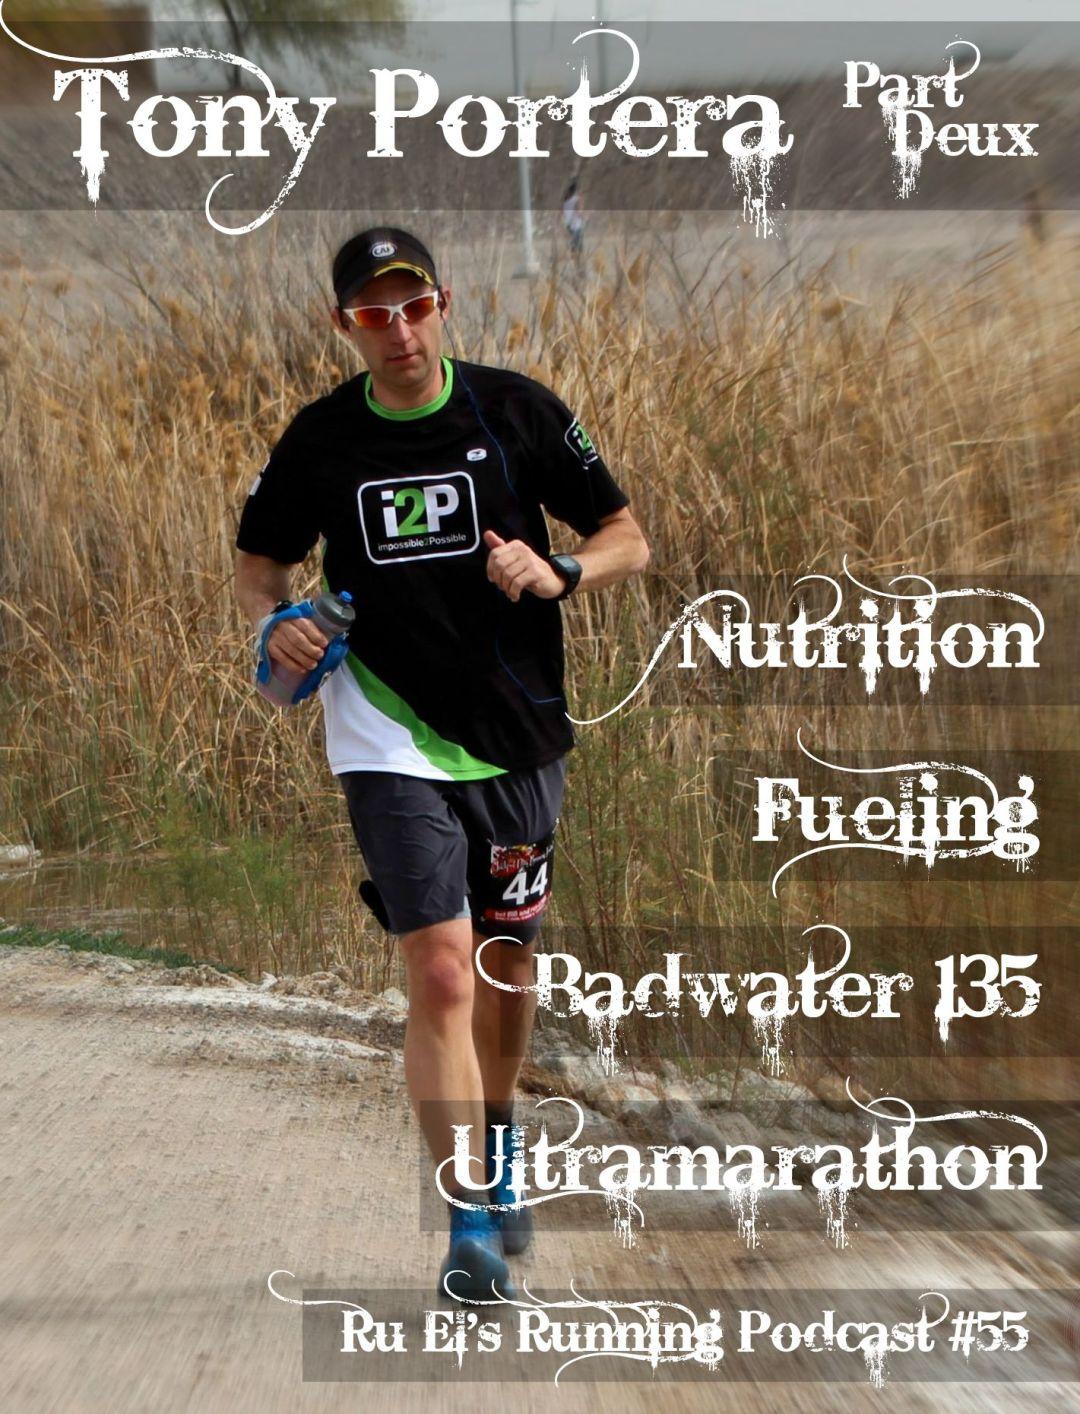 Ru El's Running 055 : Special Guest – Tony Portera – Part 2 | Badwater 135 | Ultramarathon | Nutrition